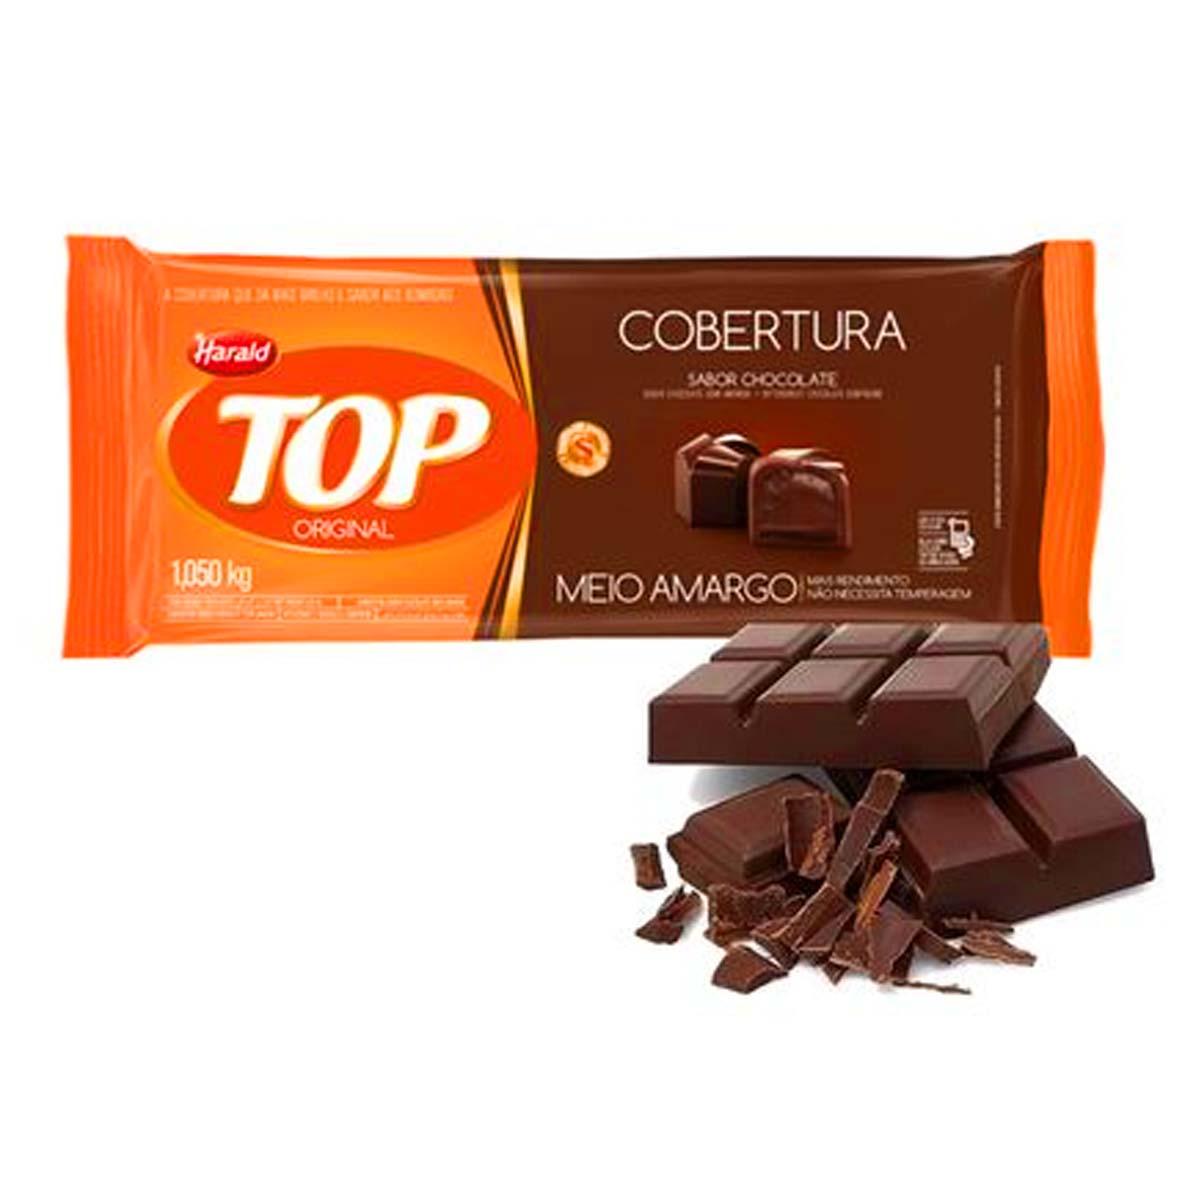 Cobertura Chocolate Meio Amargo Top 1,050 kg Harald